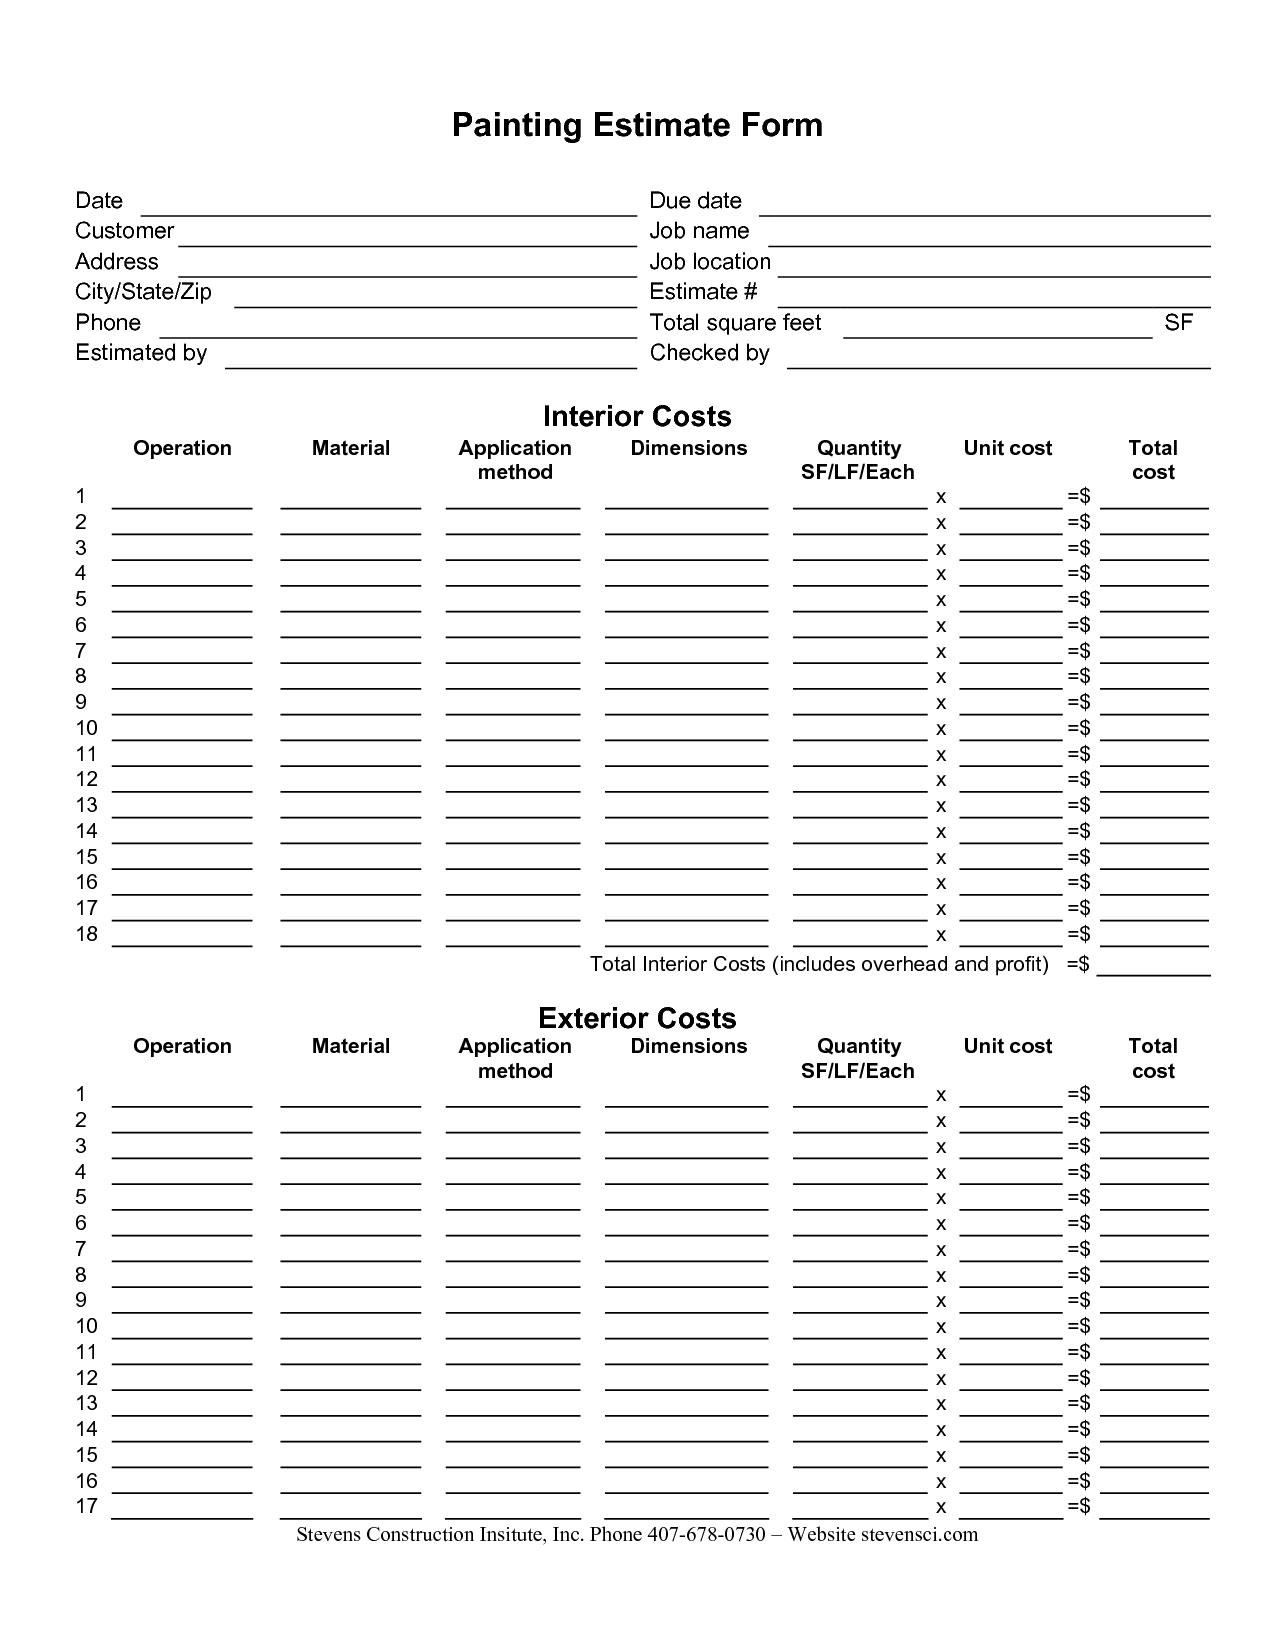 Painting Estimate Form Sample | Painting Estimate Sheet Templates And Construction Estimate Form Pdf